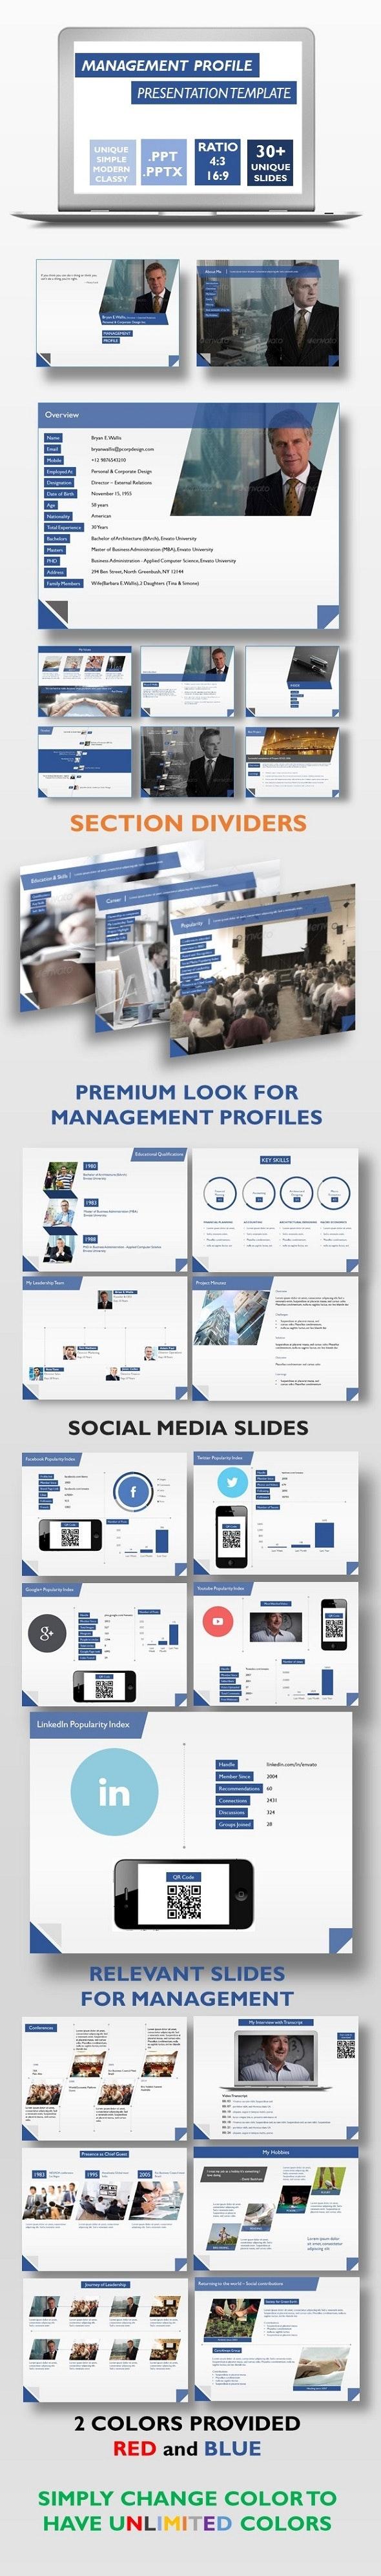 Management Profile Presentation Template - Business PowerPoint Templates